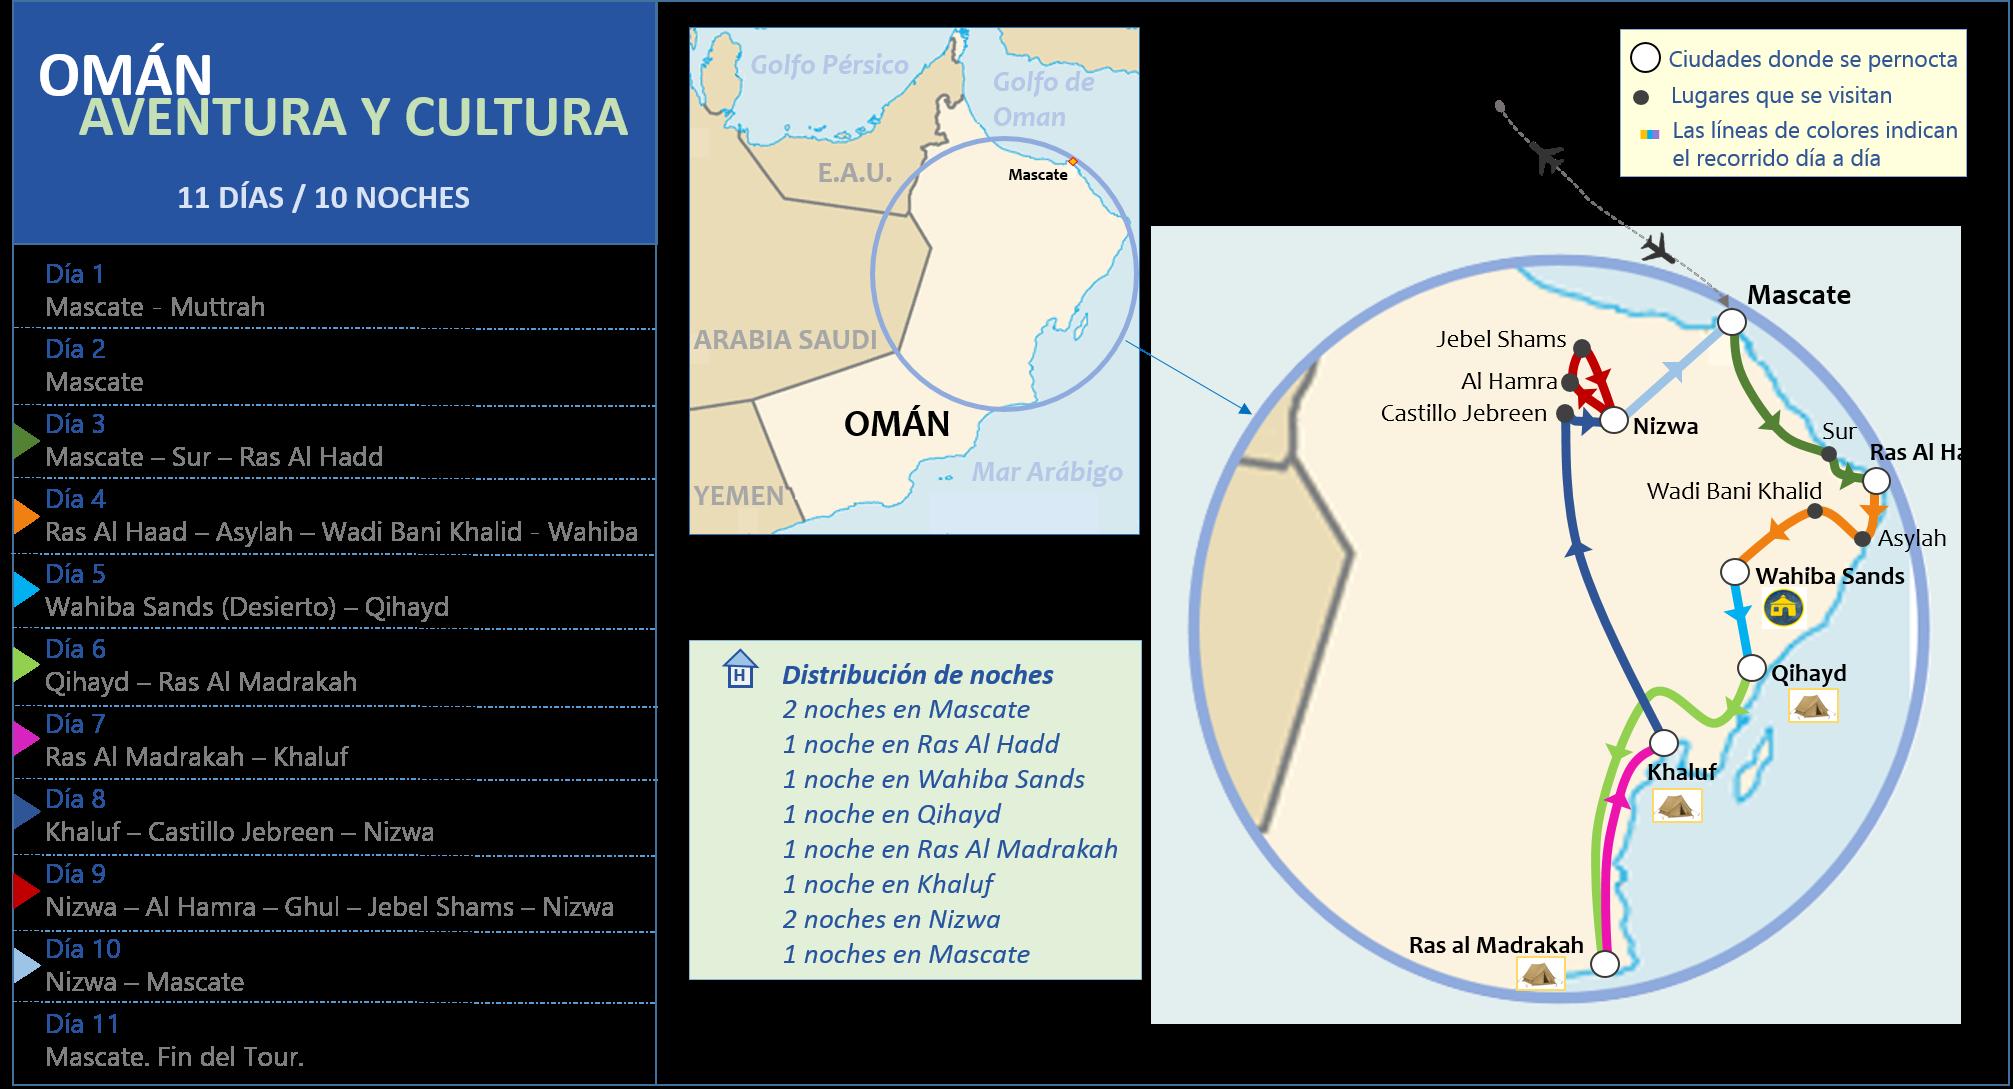 Omán Aventura y Cultura 11d - 10n